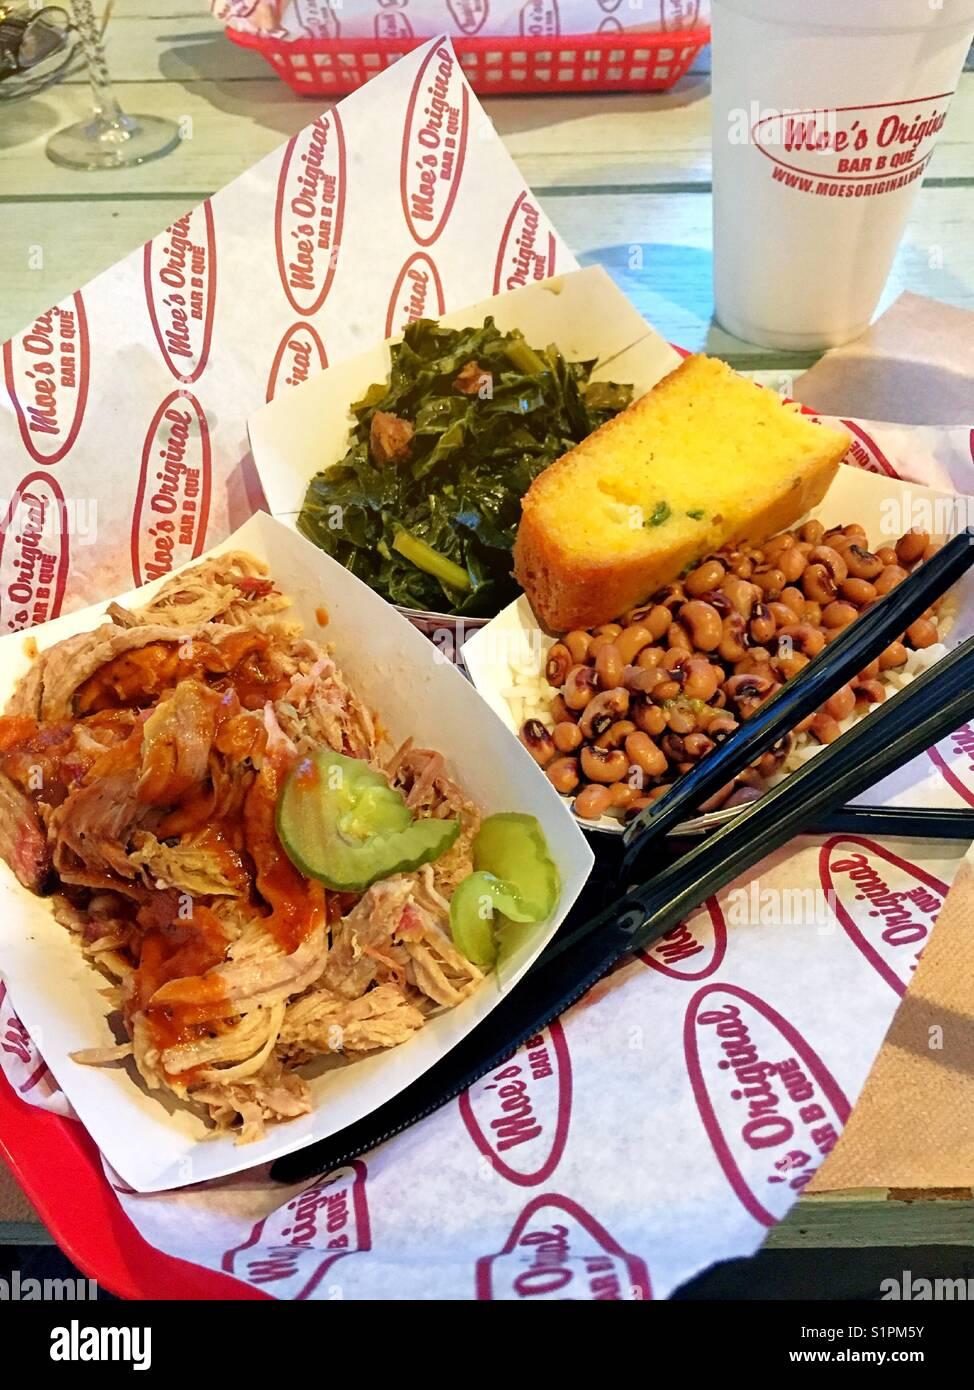 Pulled pork meal at Moe's BBQ, Pawleys Island, South Carolina - Stock Image